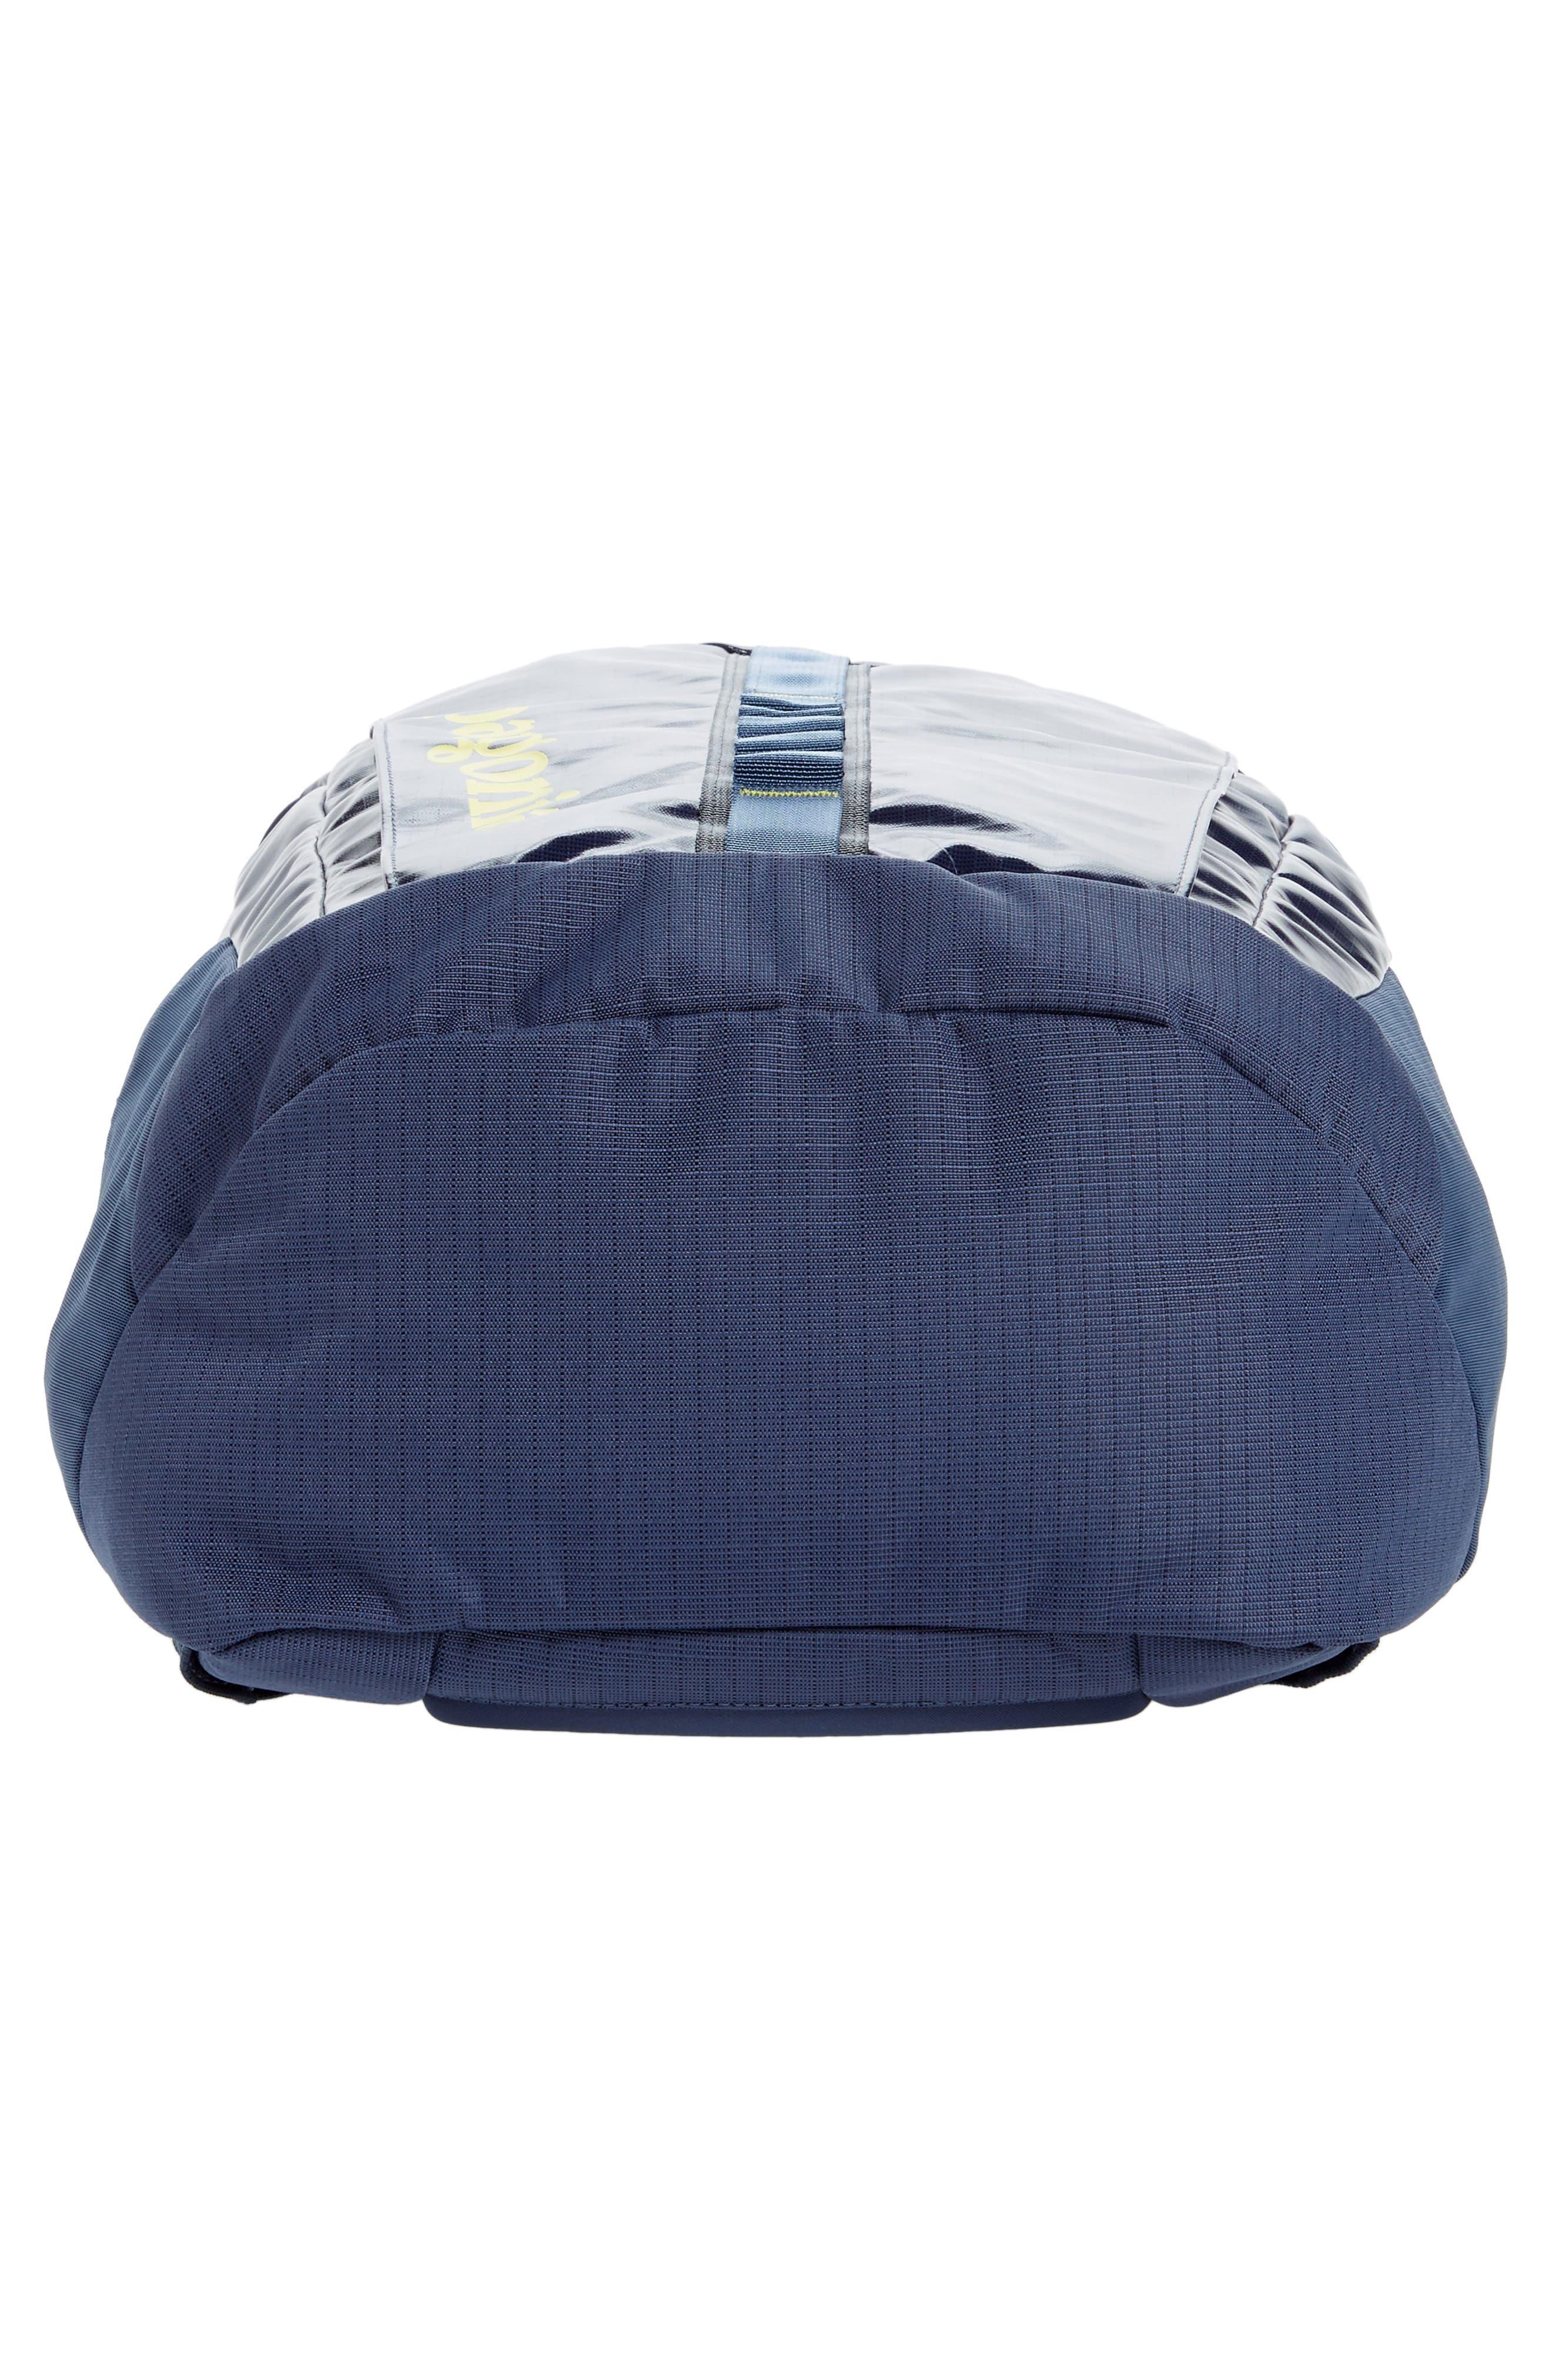 Black Hole 25 Liter Backpack,                             Alternate thumbnail 6, color,                             DOLOMITE BLUE